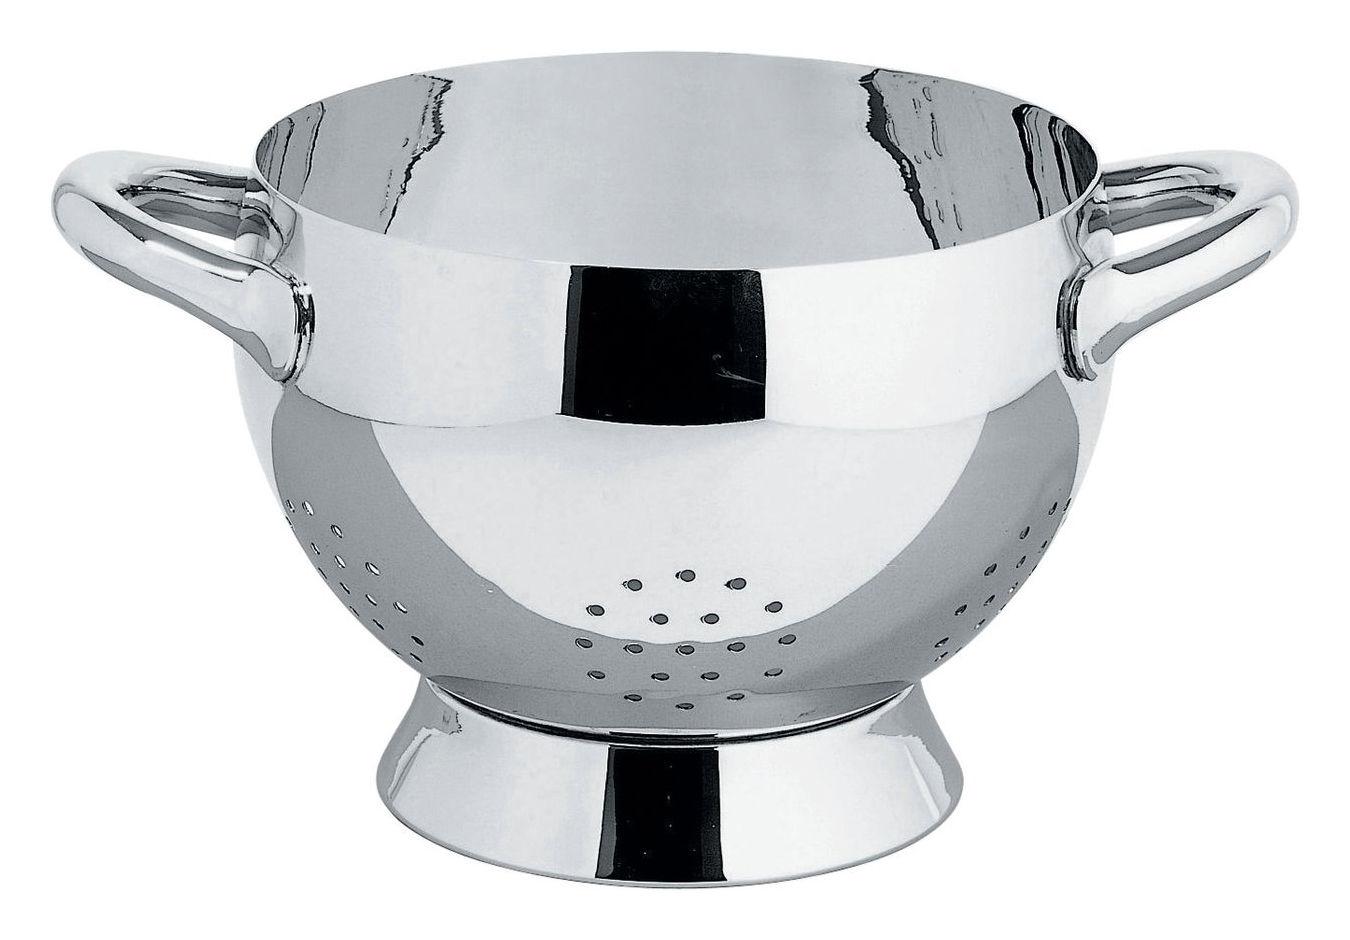 Kitchenware - Kitchen Equipment - Mami Colander by Alessi - Polished steel - Stainless steel